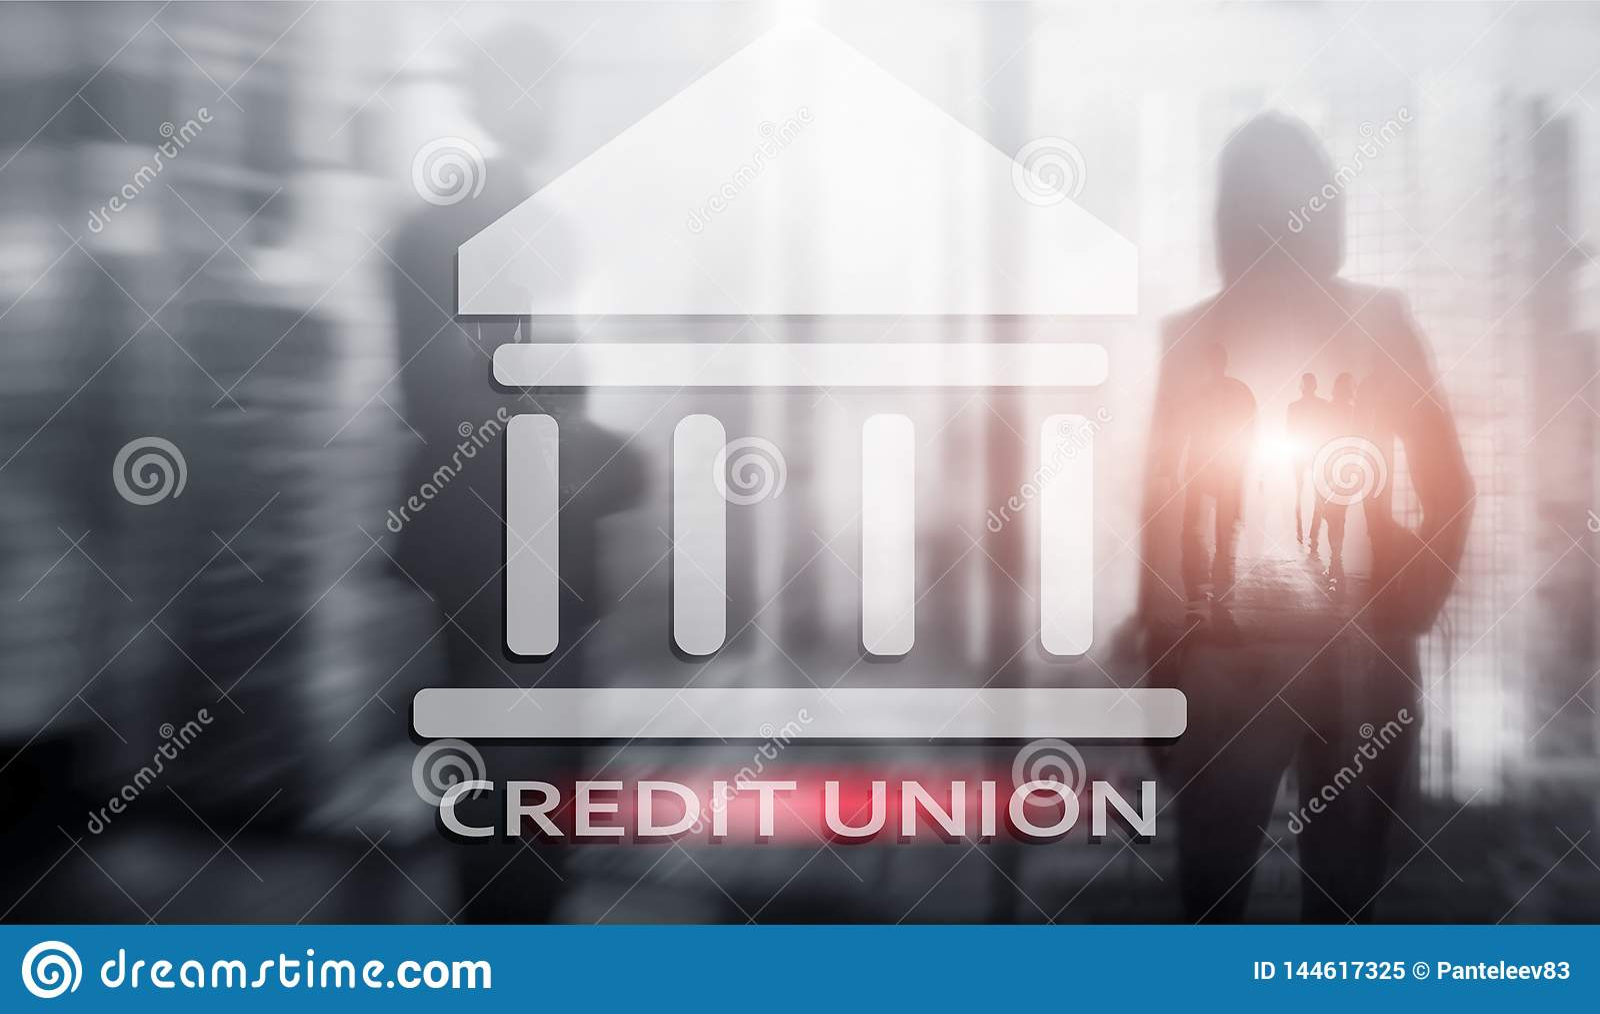 сайт кредит союз банк